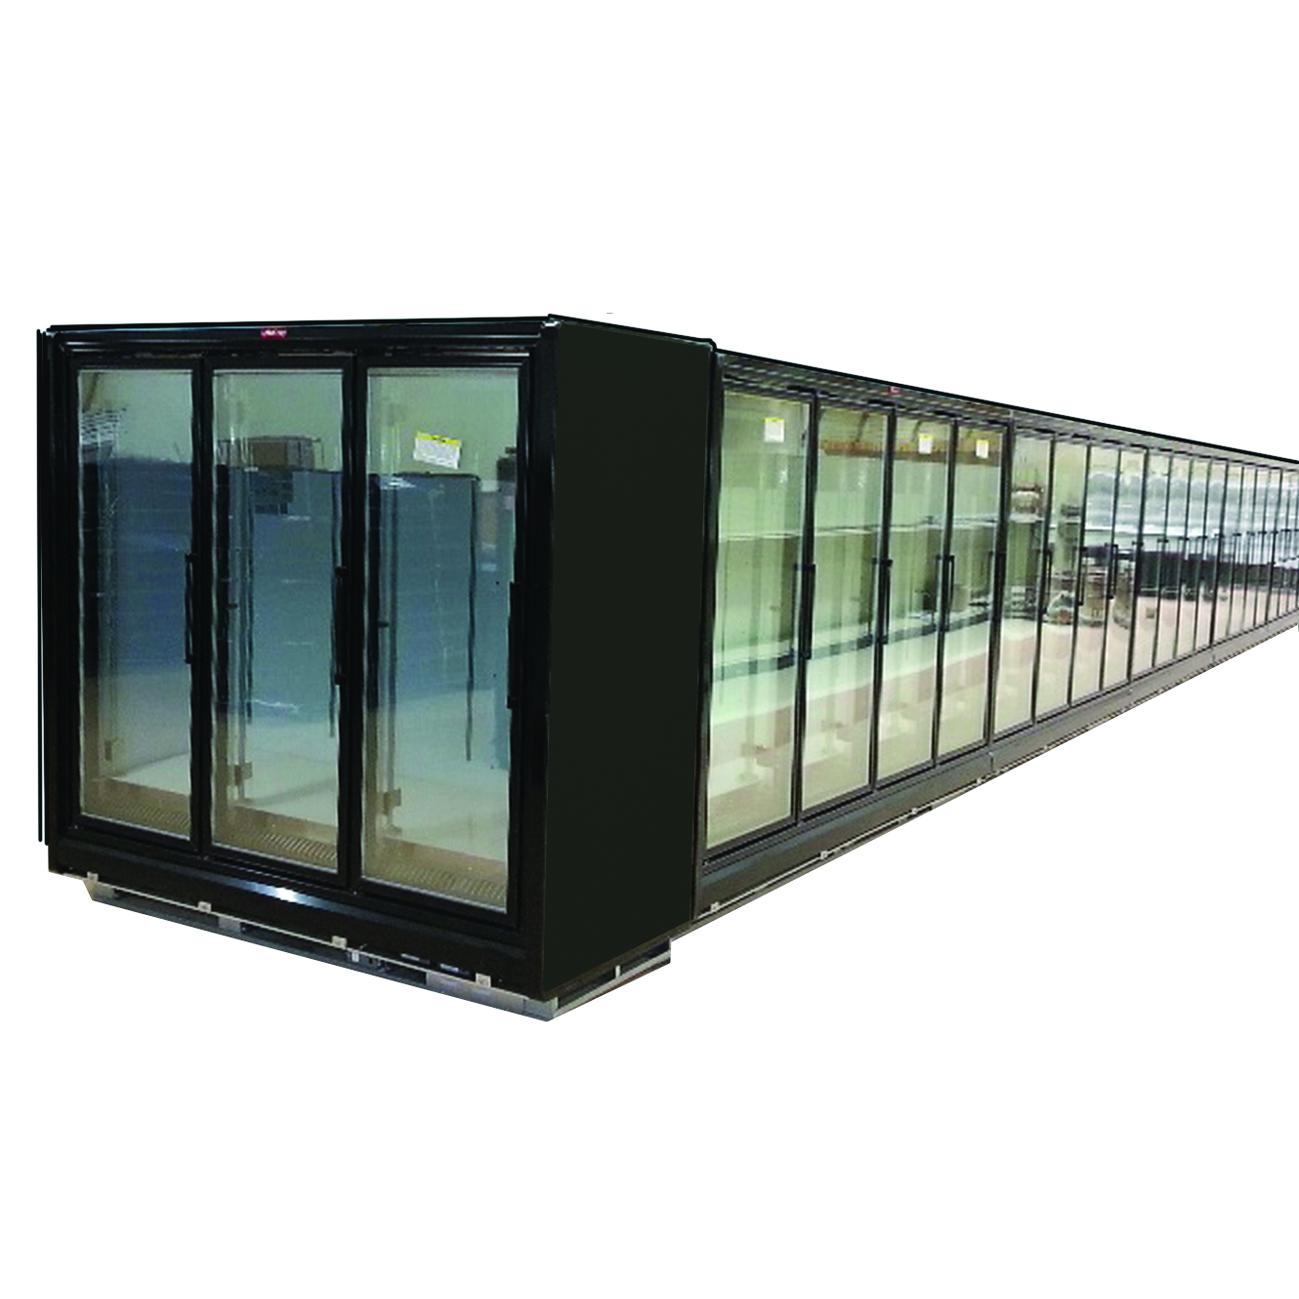 Howard-McCray RIN4-24-LED-B refrigerator, merchandiser